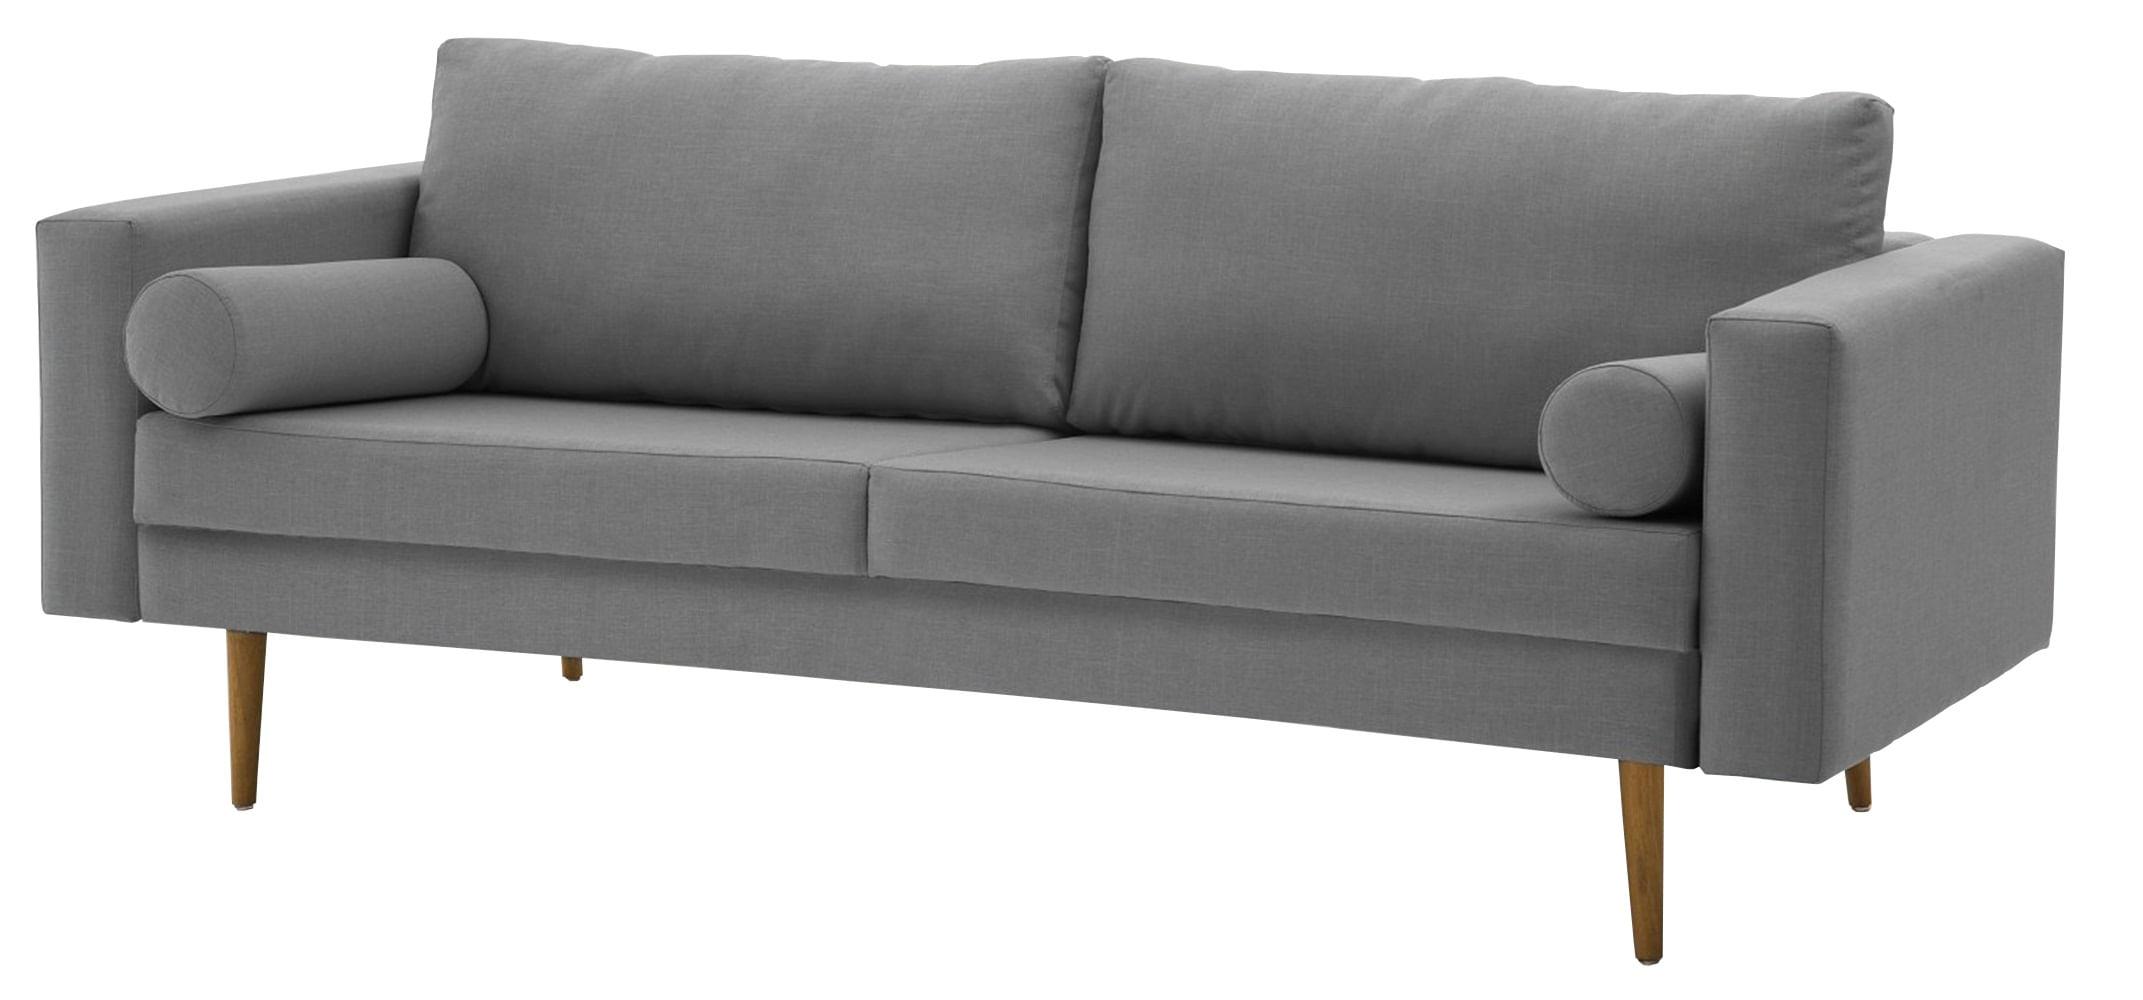 Sofa Rolls Cinza Base Castanho 3 Lugares - 50356